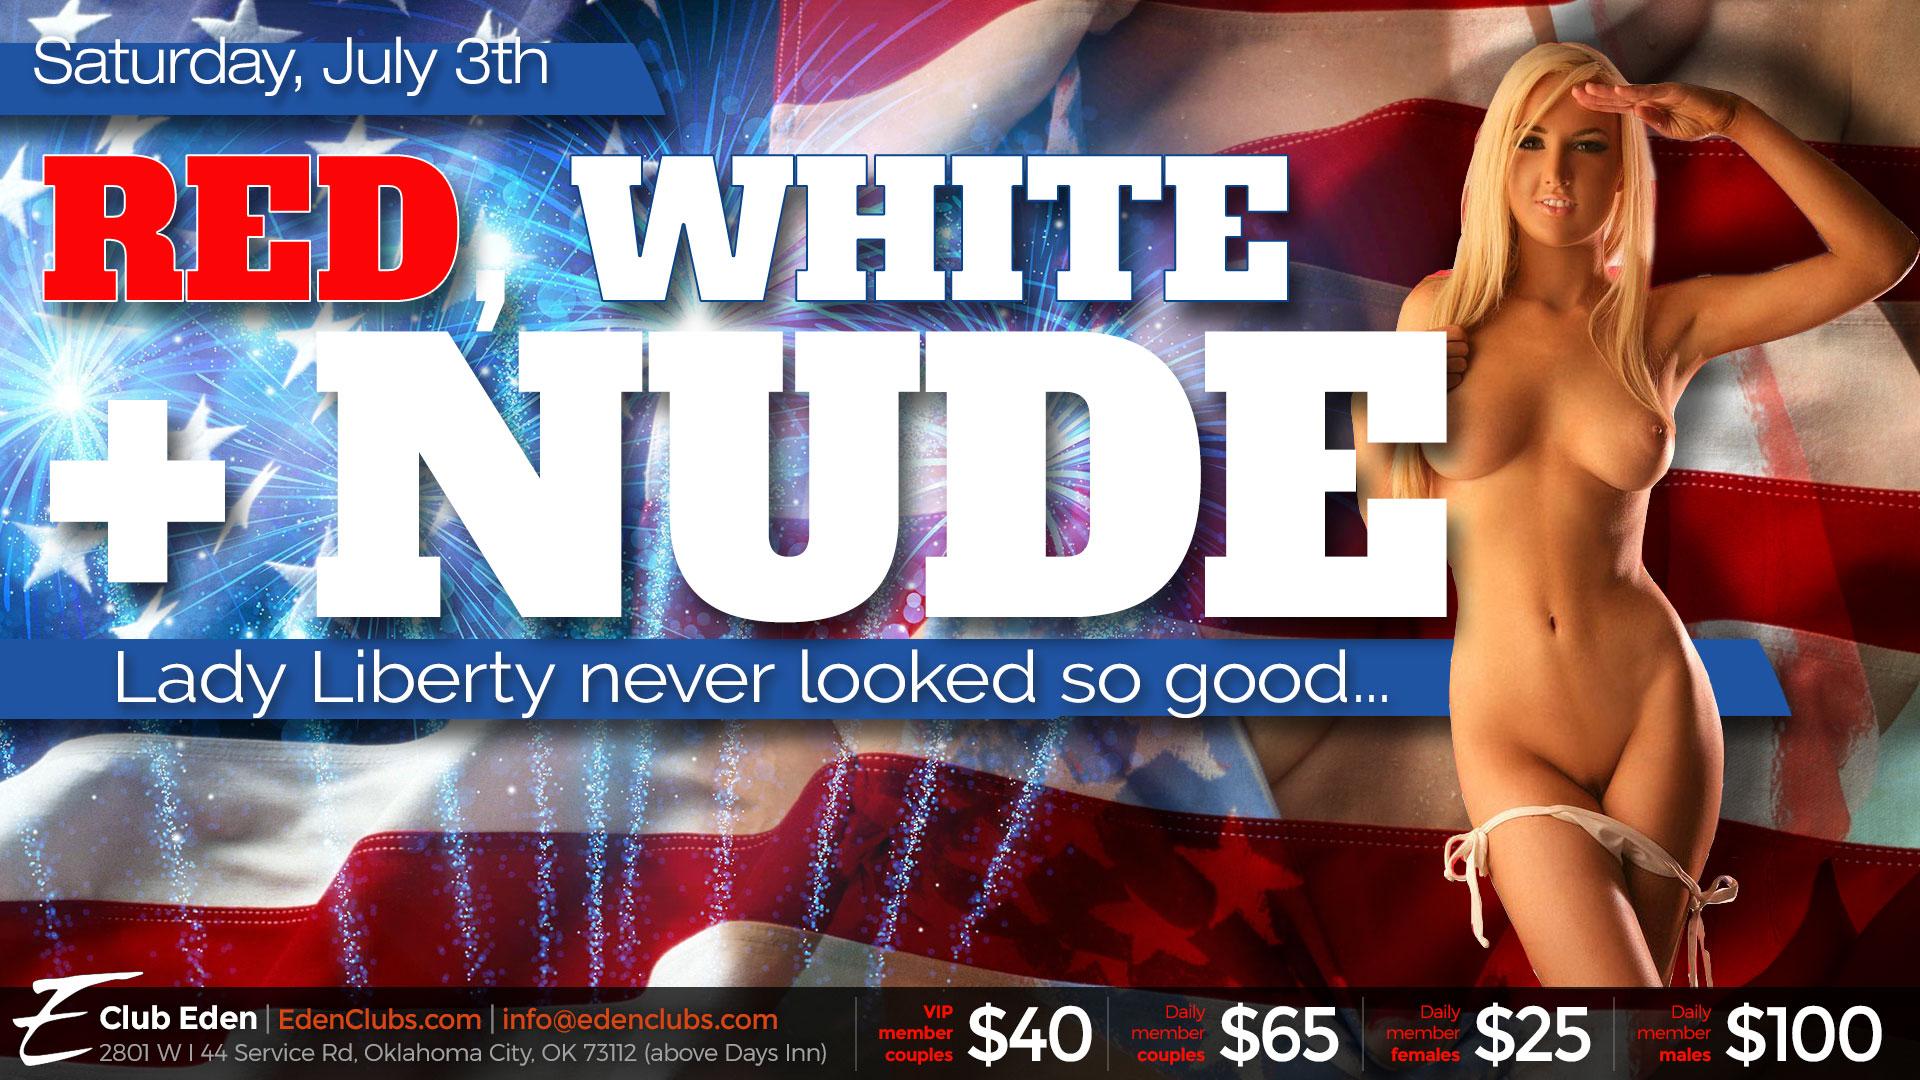 070321-Red-White-Nude-eden-okc-tv